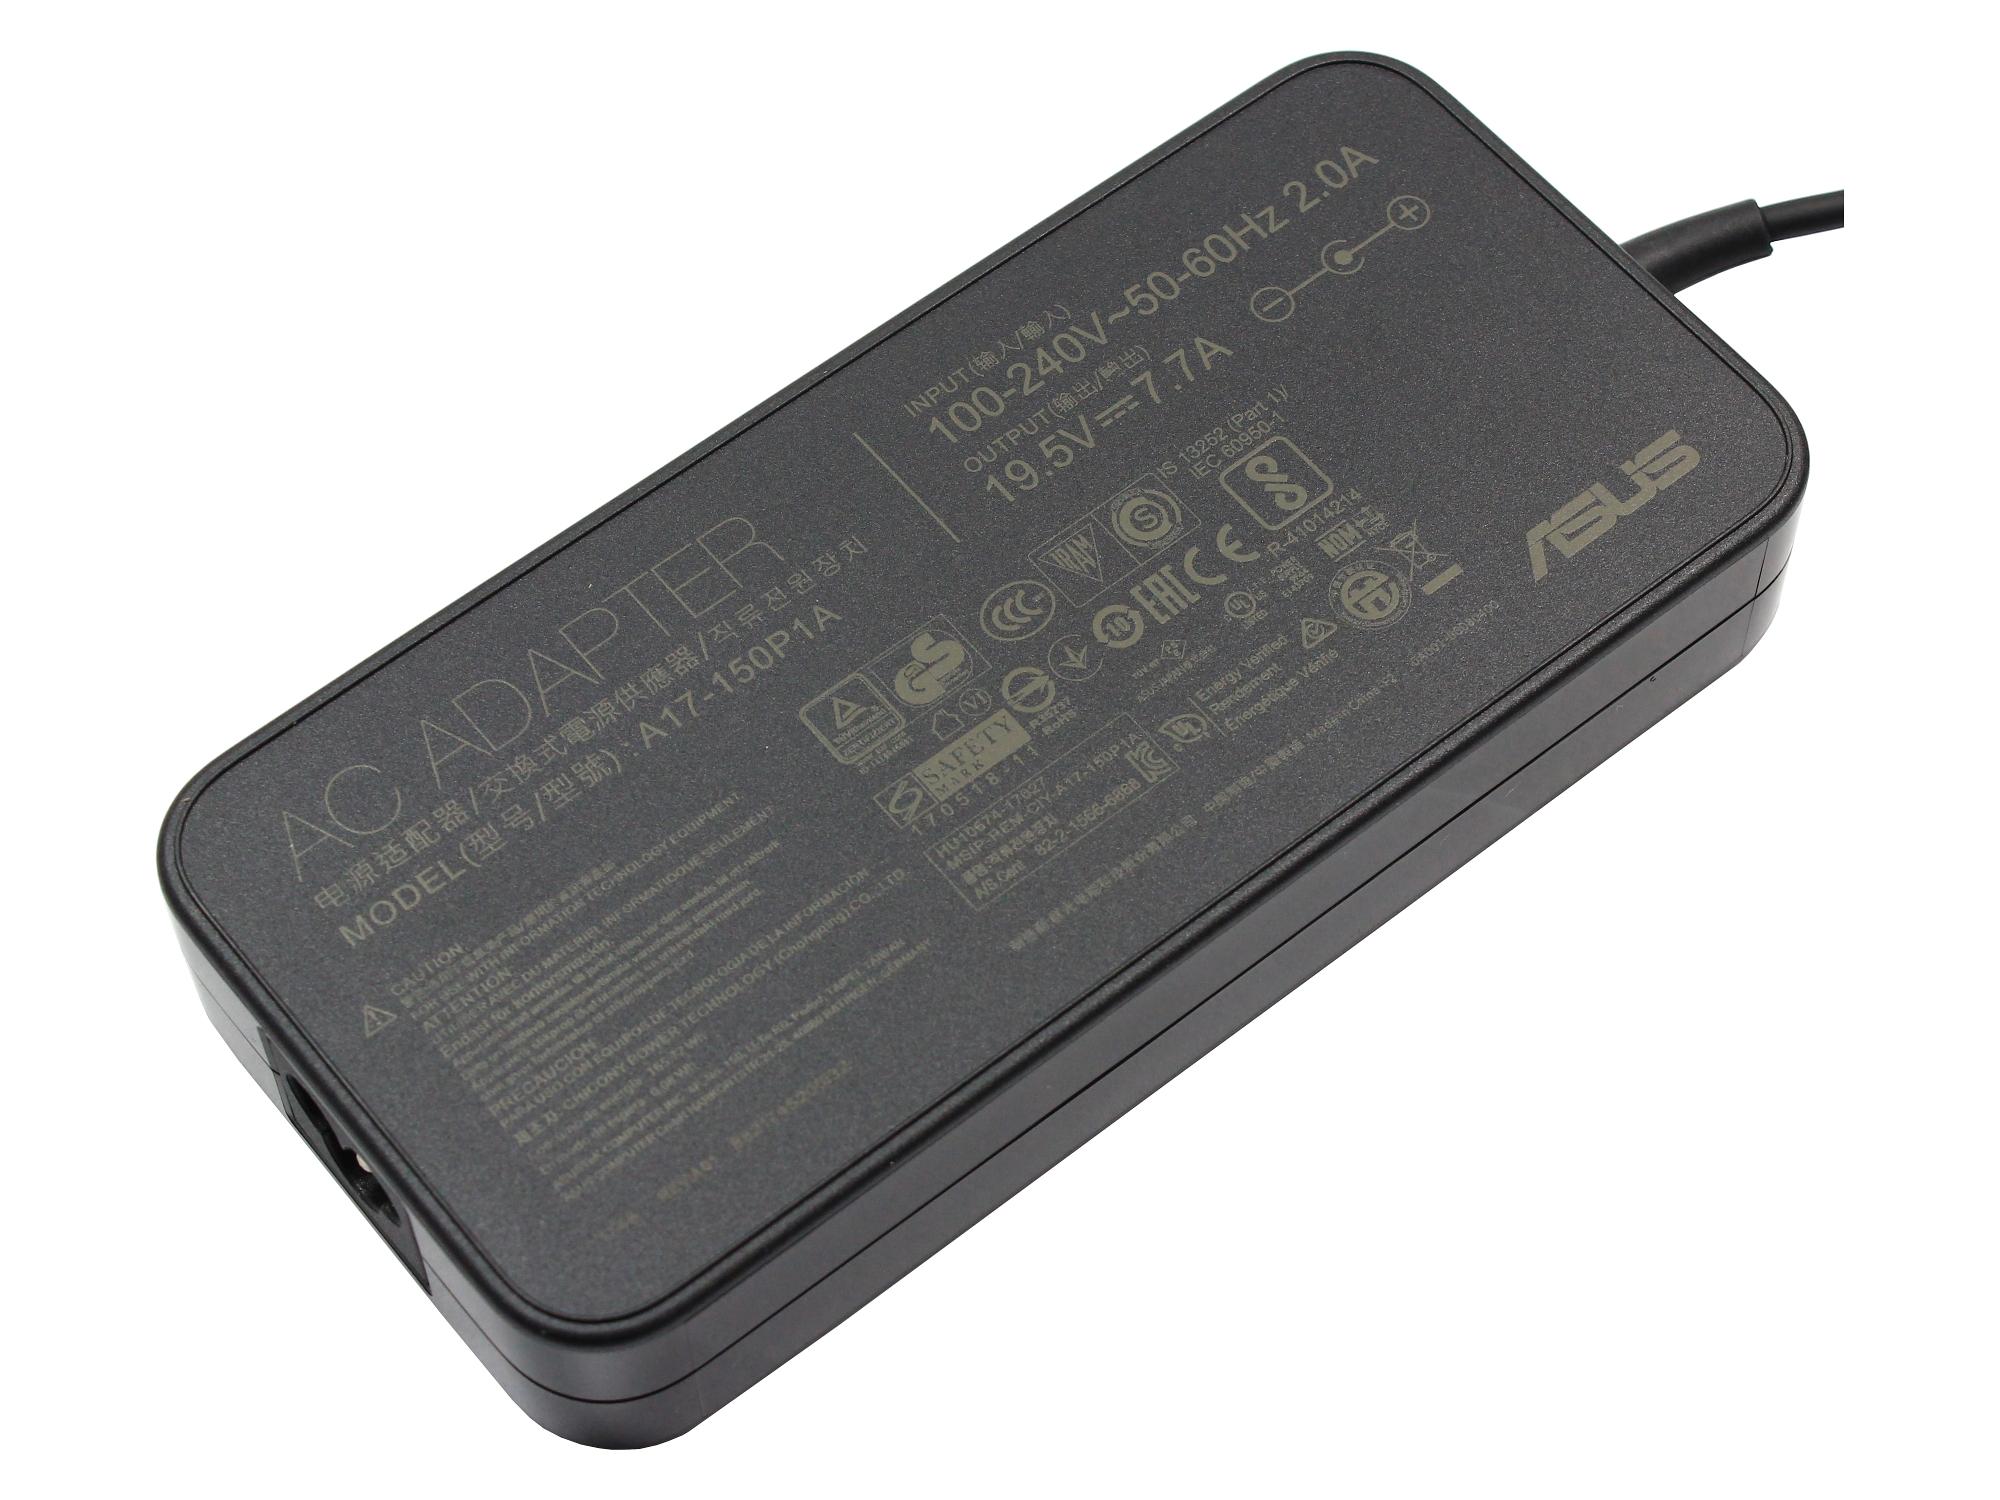 Incarcator original ASUS TUF554GM, 150W conector 5.5mm